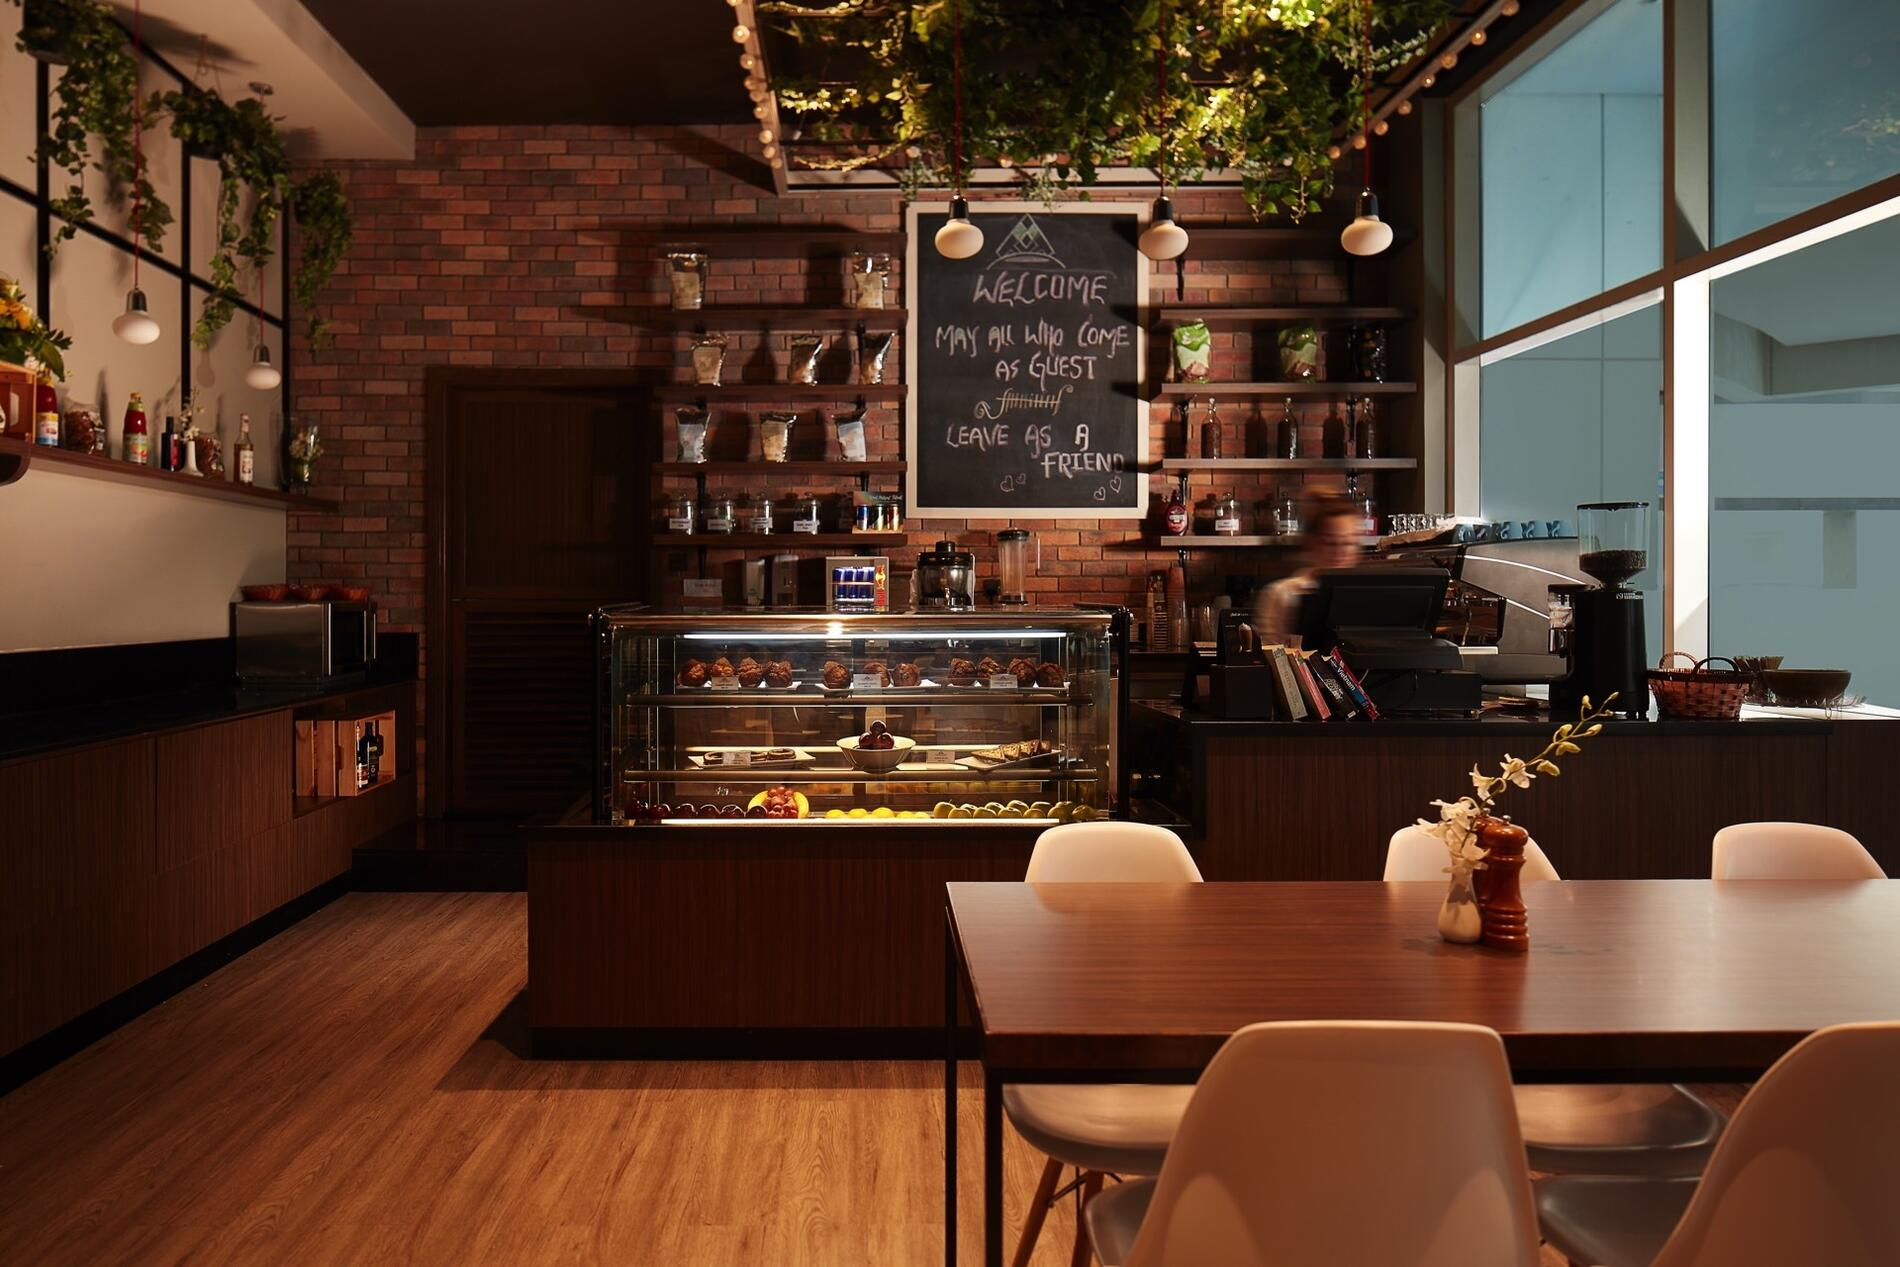 Zuri Café at Treppan Hotel and Suites